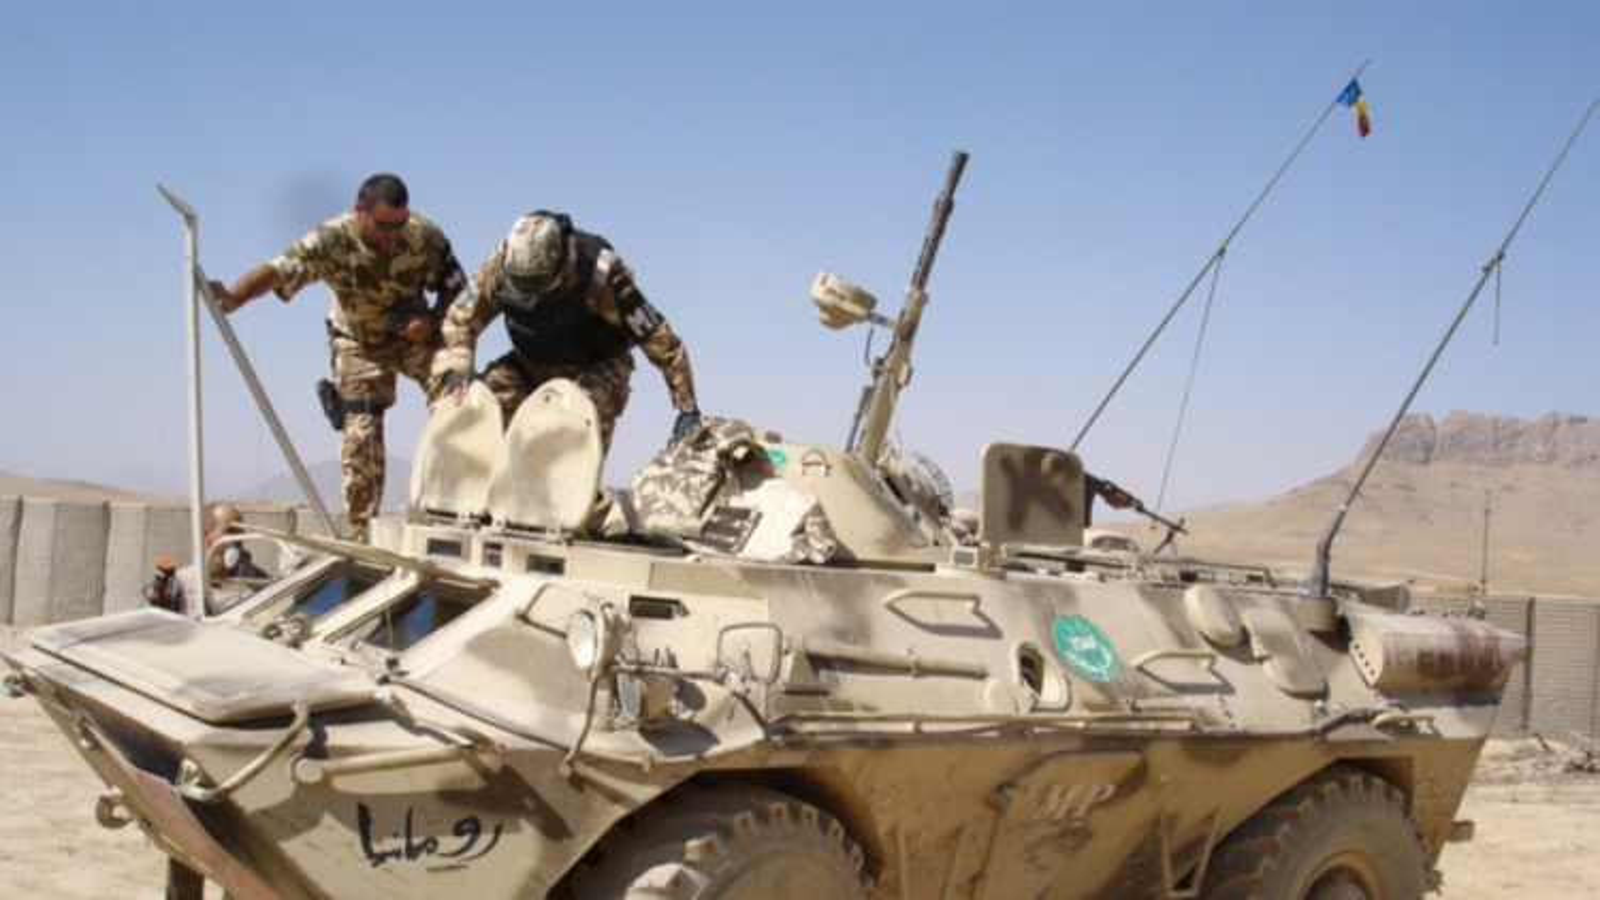 Romania tuyên bố rút binh sĩ khỏi Afghanistan